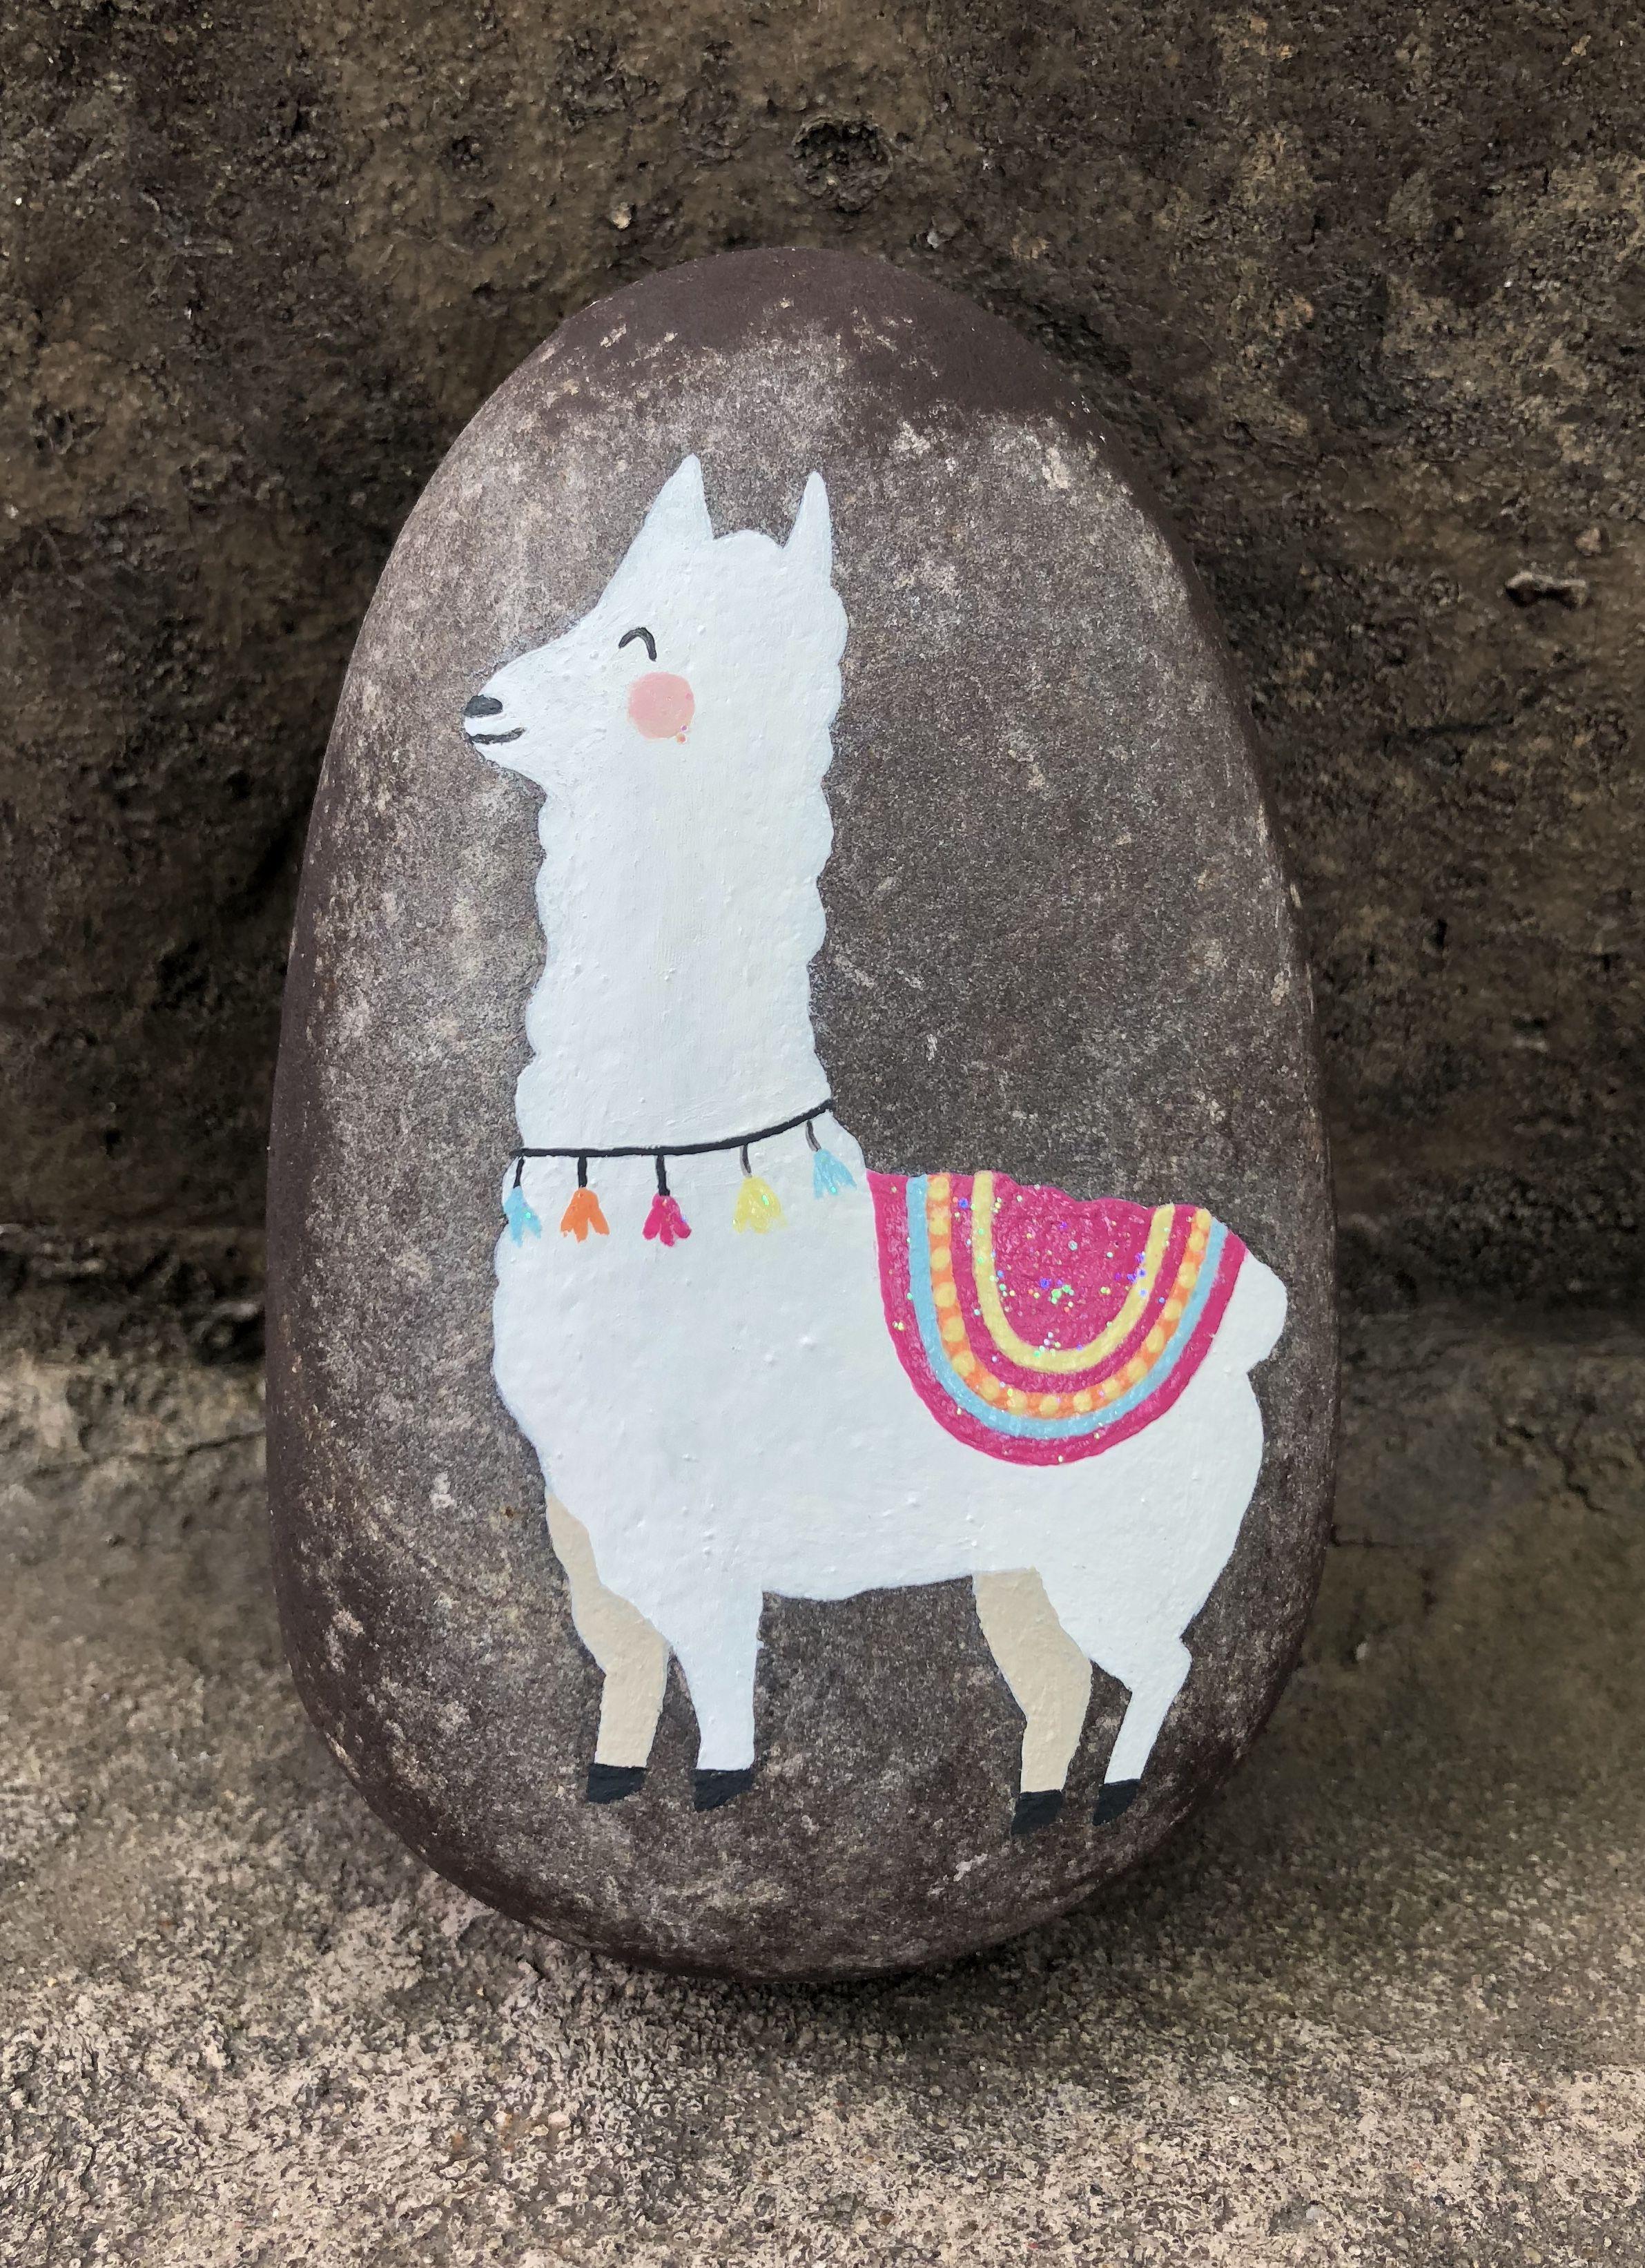 Llama painted rock by Christa Keeler